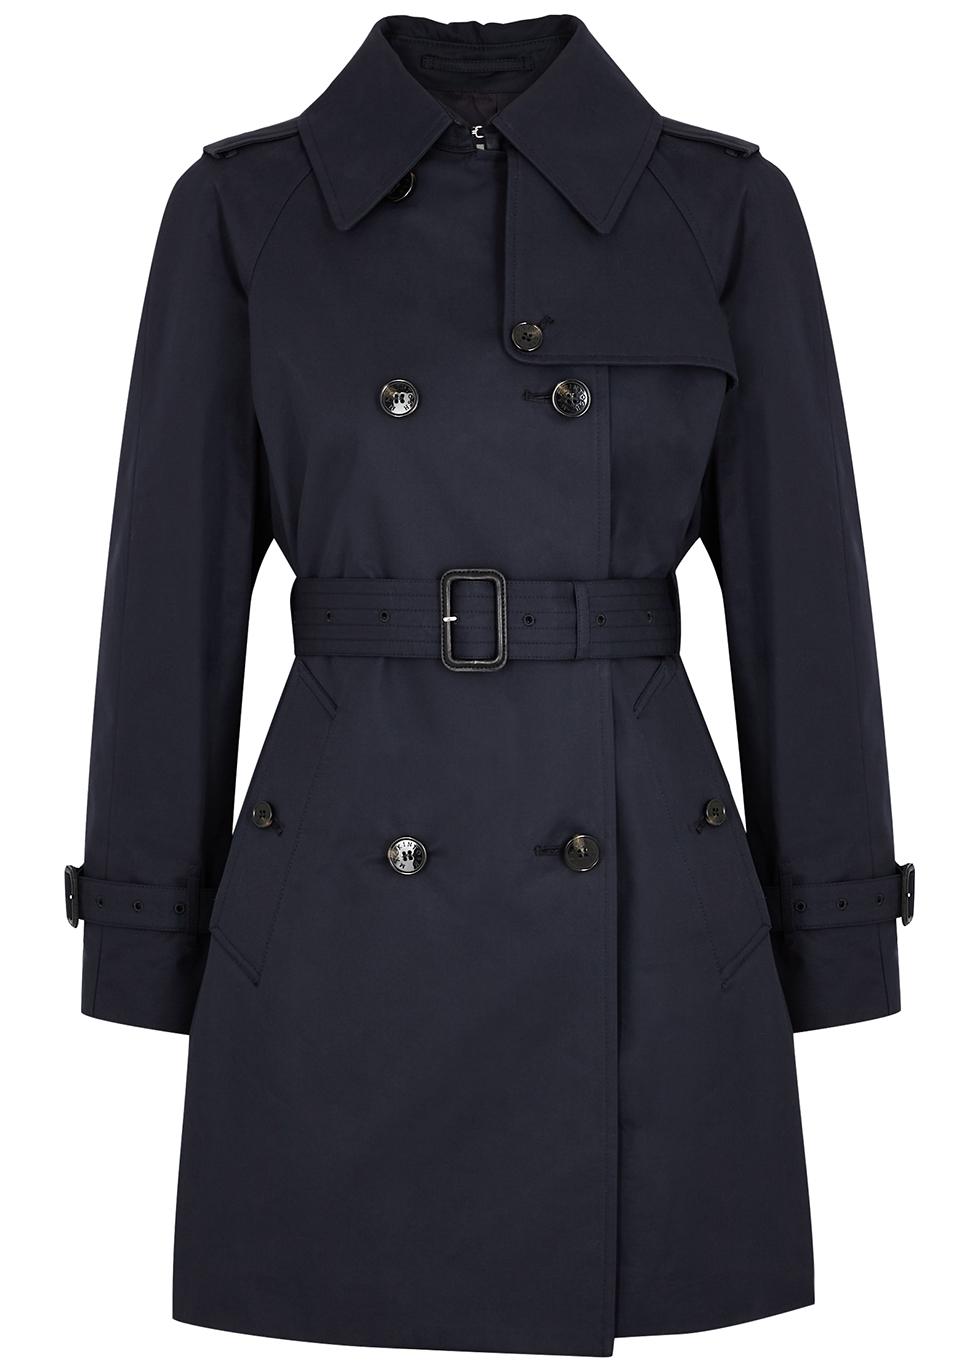 Muie navy cotton trench coat